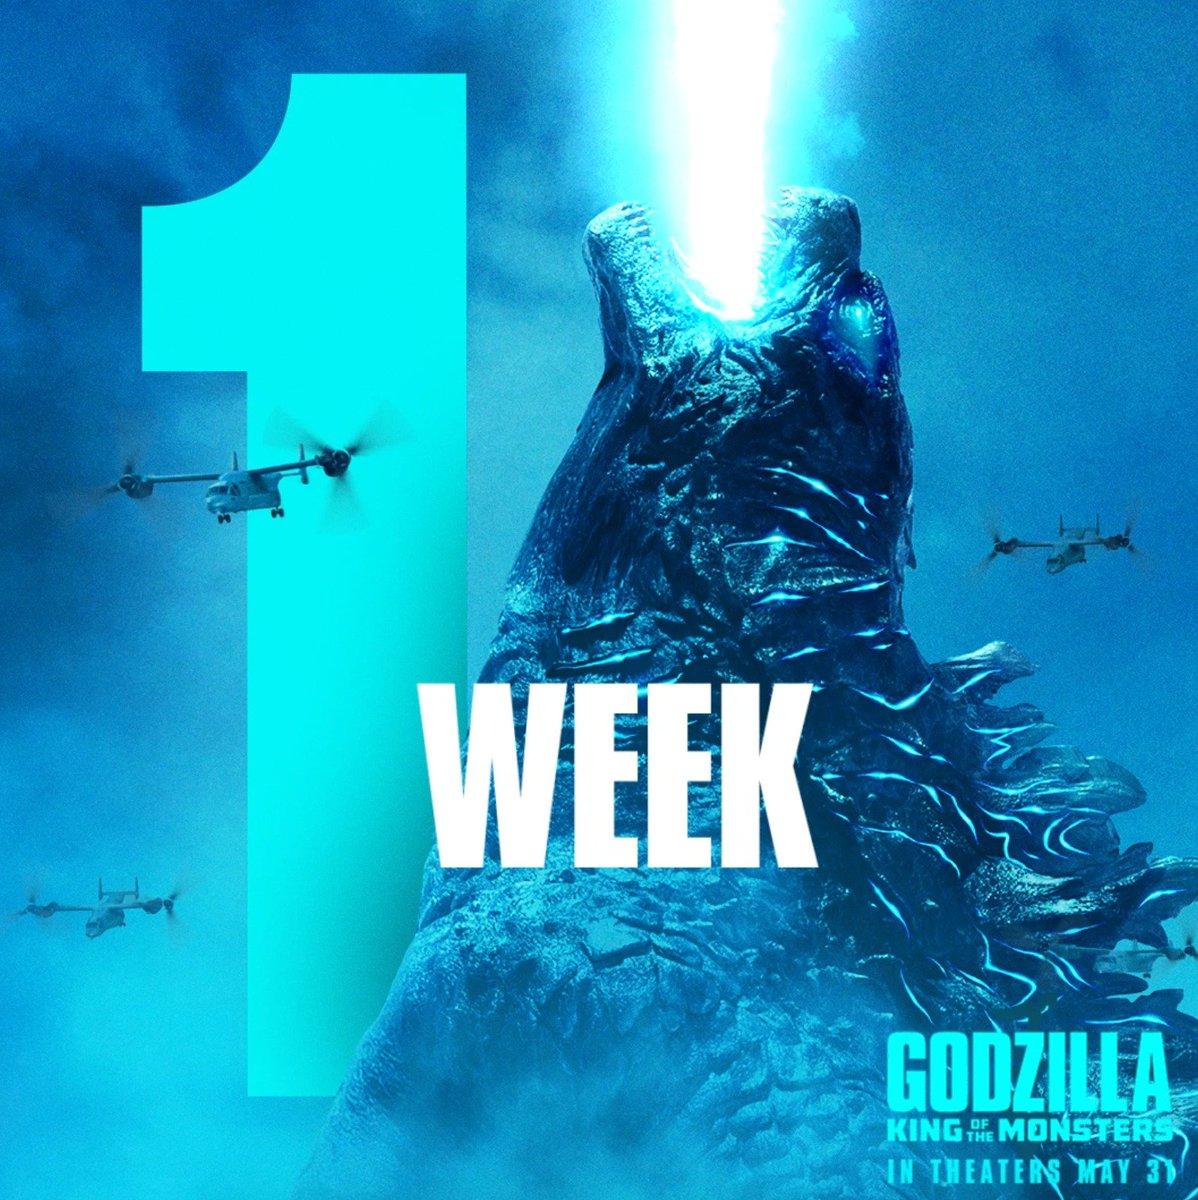 HEAR. HIM. ROAR. #GodzillaMovie in theaters in 1 WEEK. Get advance tickets now: Fandango.com/godzillamovie